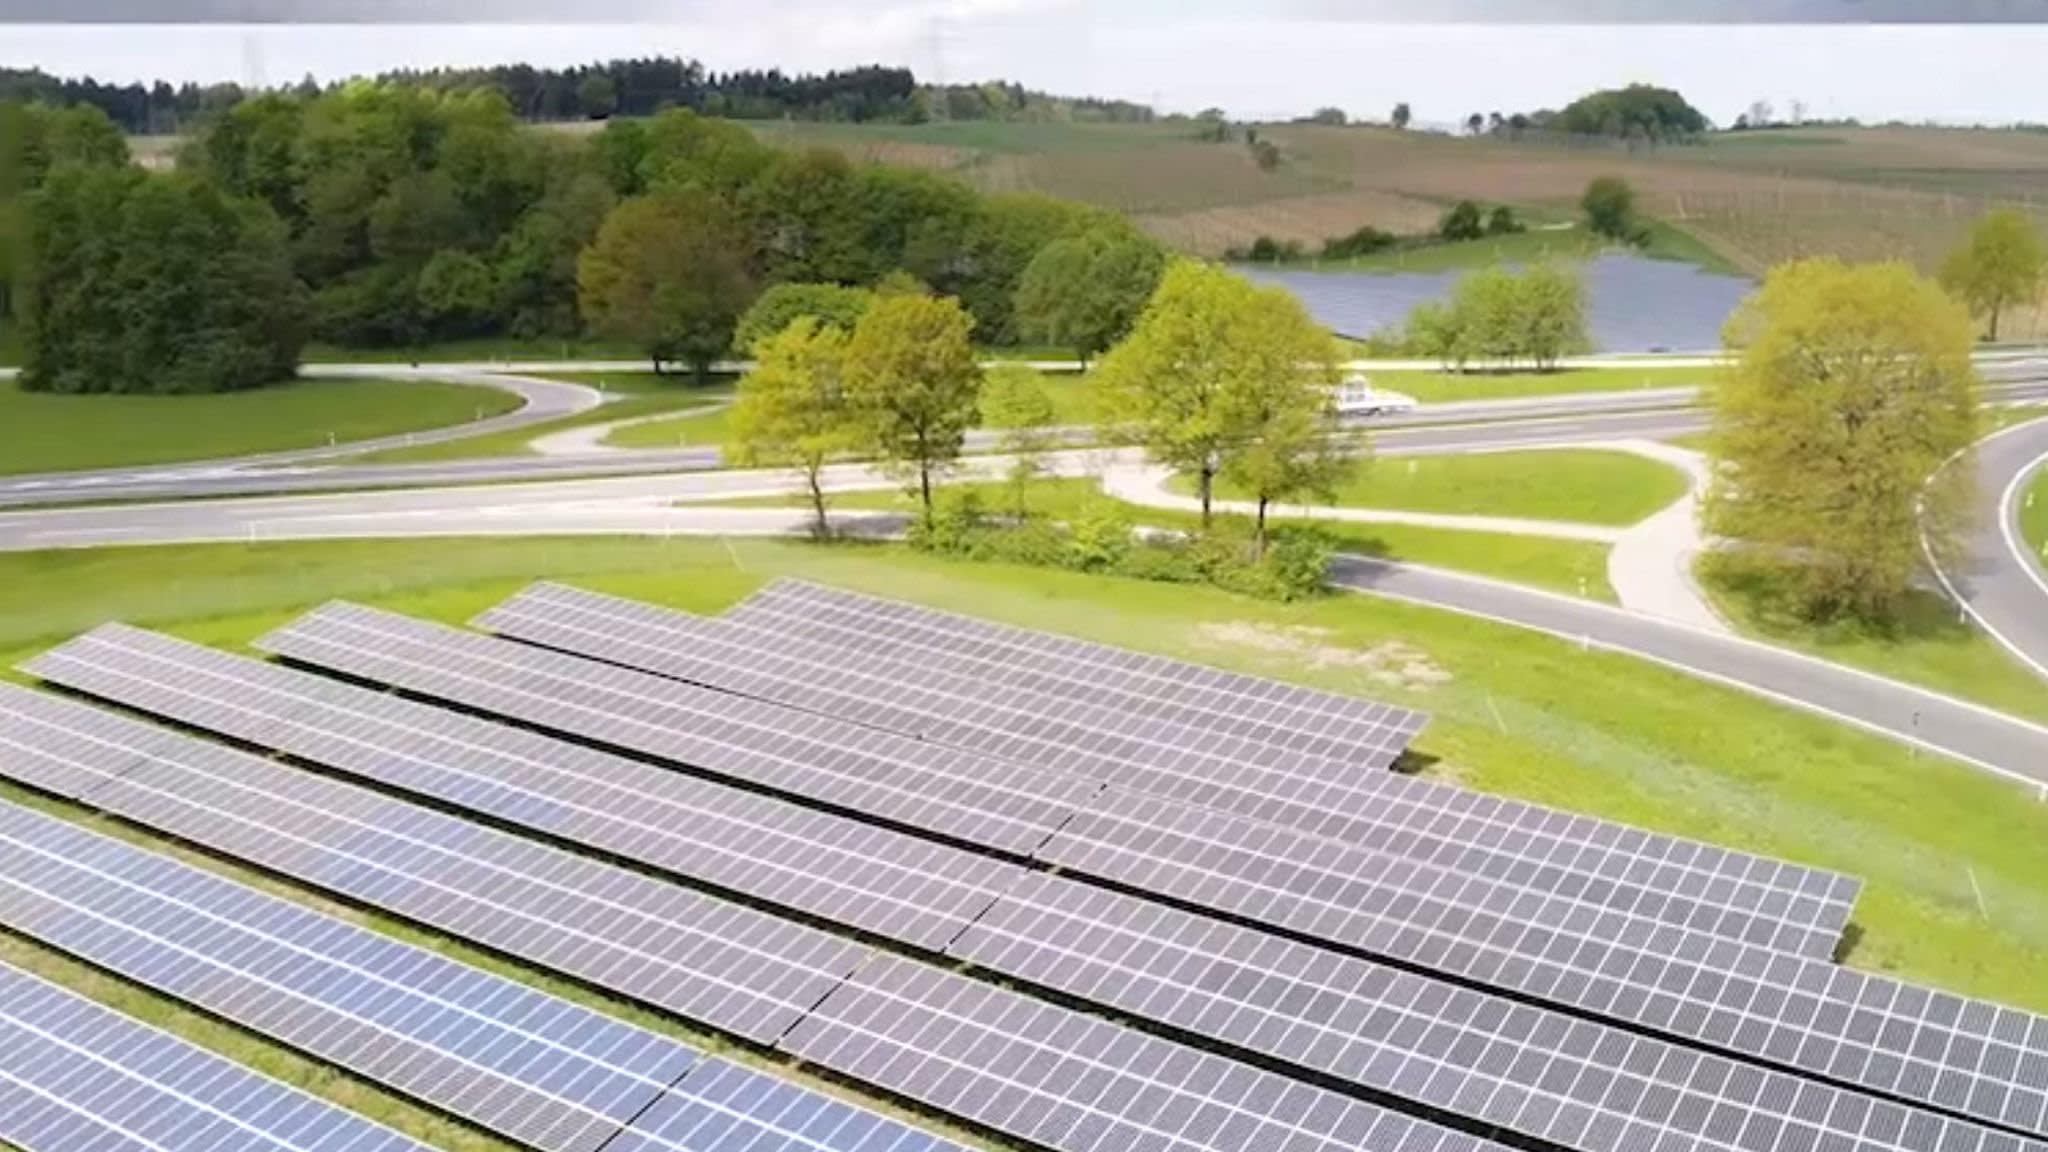 Huawei solar gear could threaten US grid, warn lawmakers | Financial Times